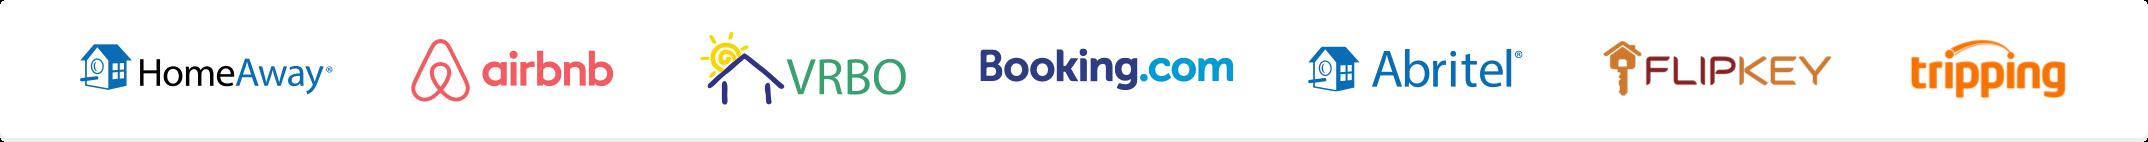 homeaway calendar booking.com airbnb vrbo abritel flipkey tripping